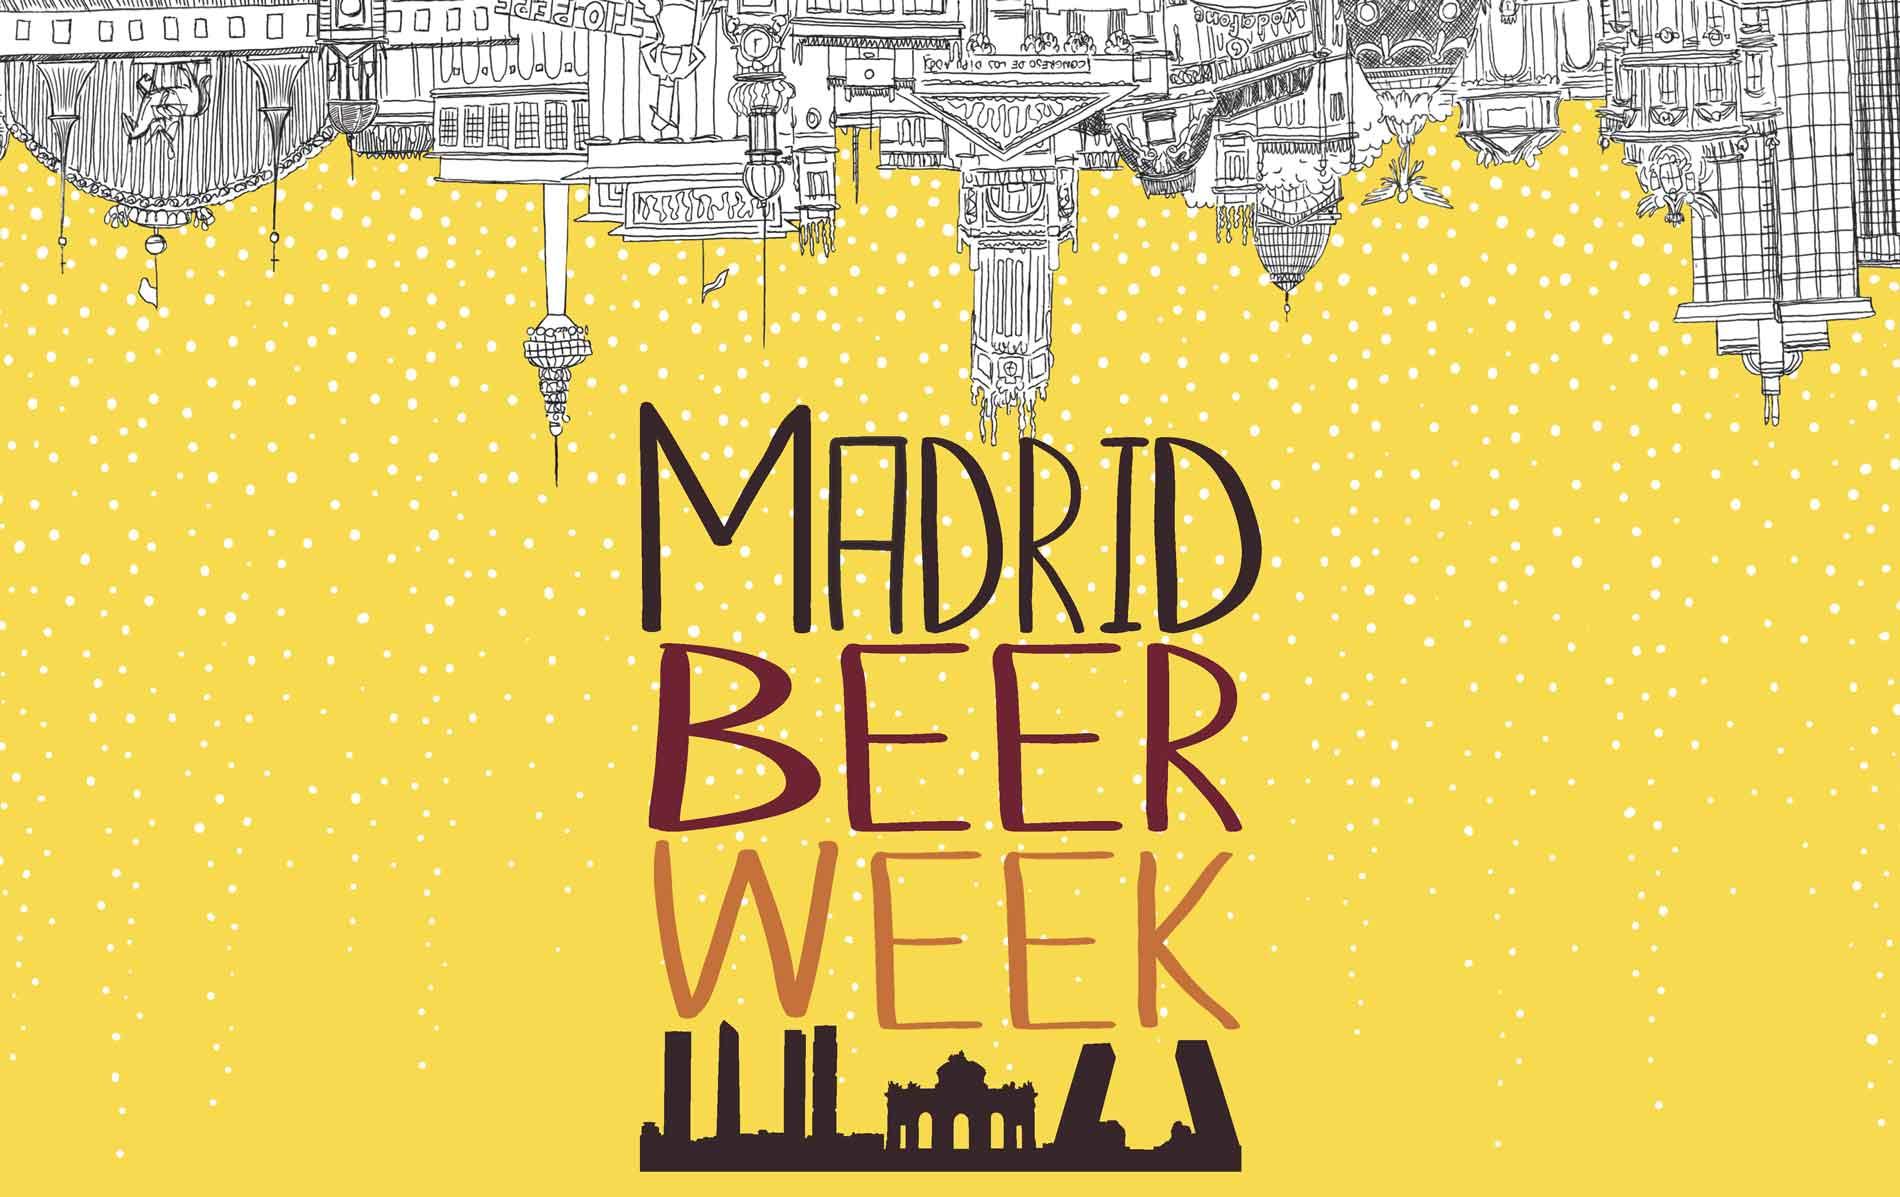 Madrid Beer Week 2016, regresa la locura cervecera a Madrid